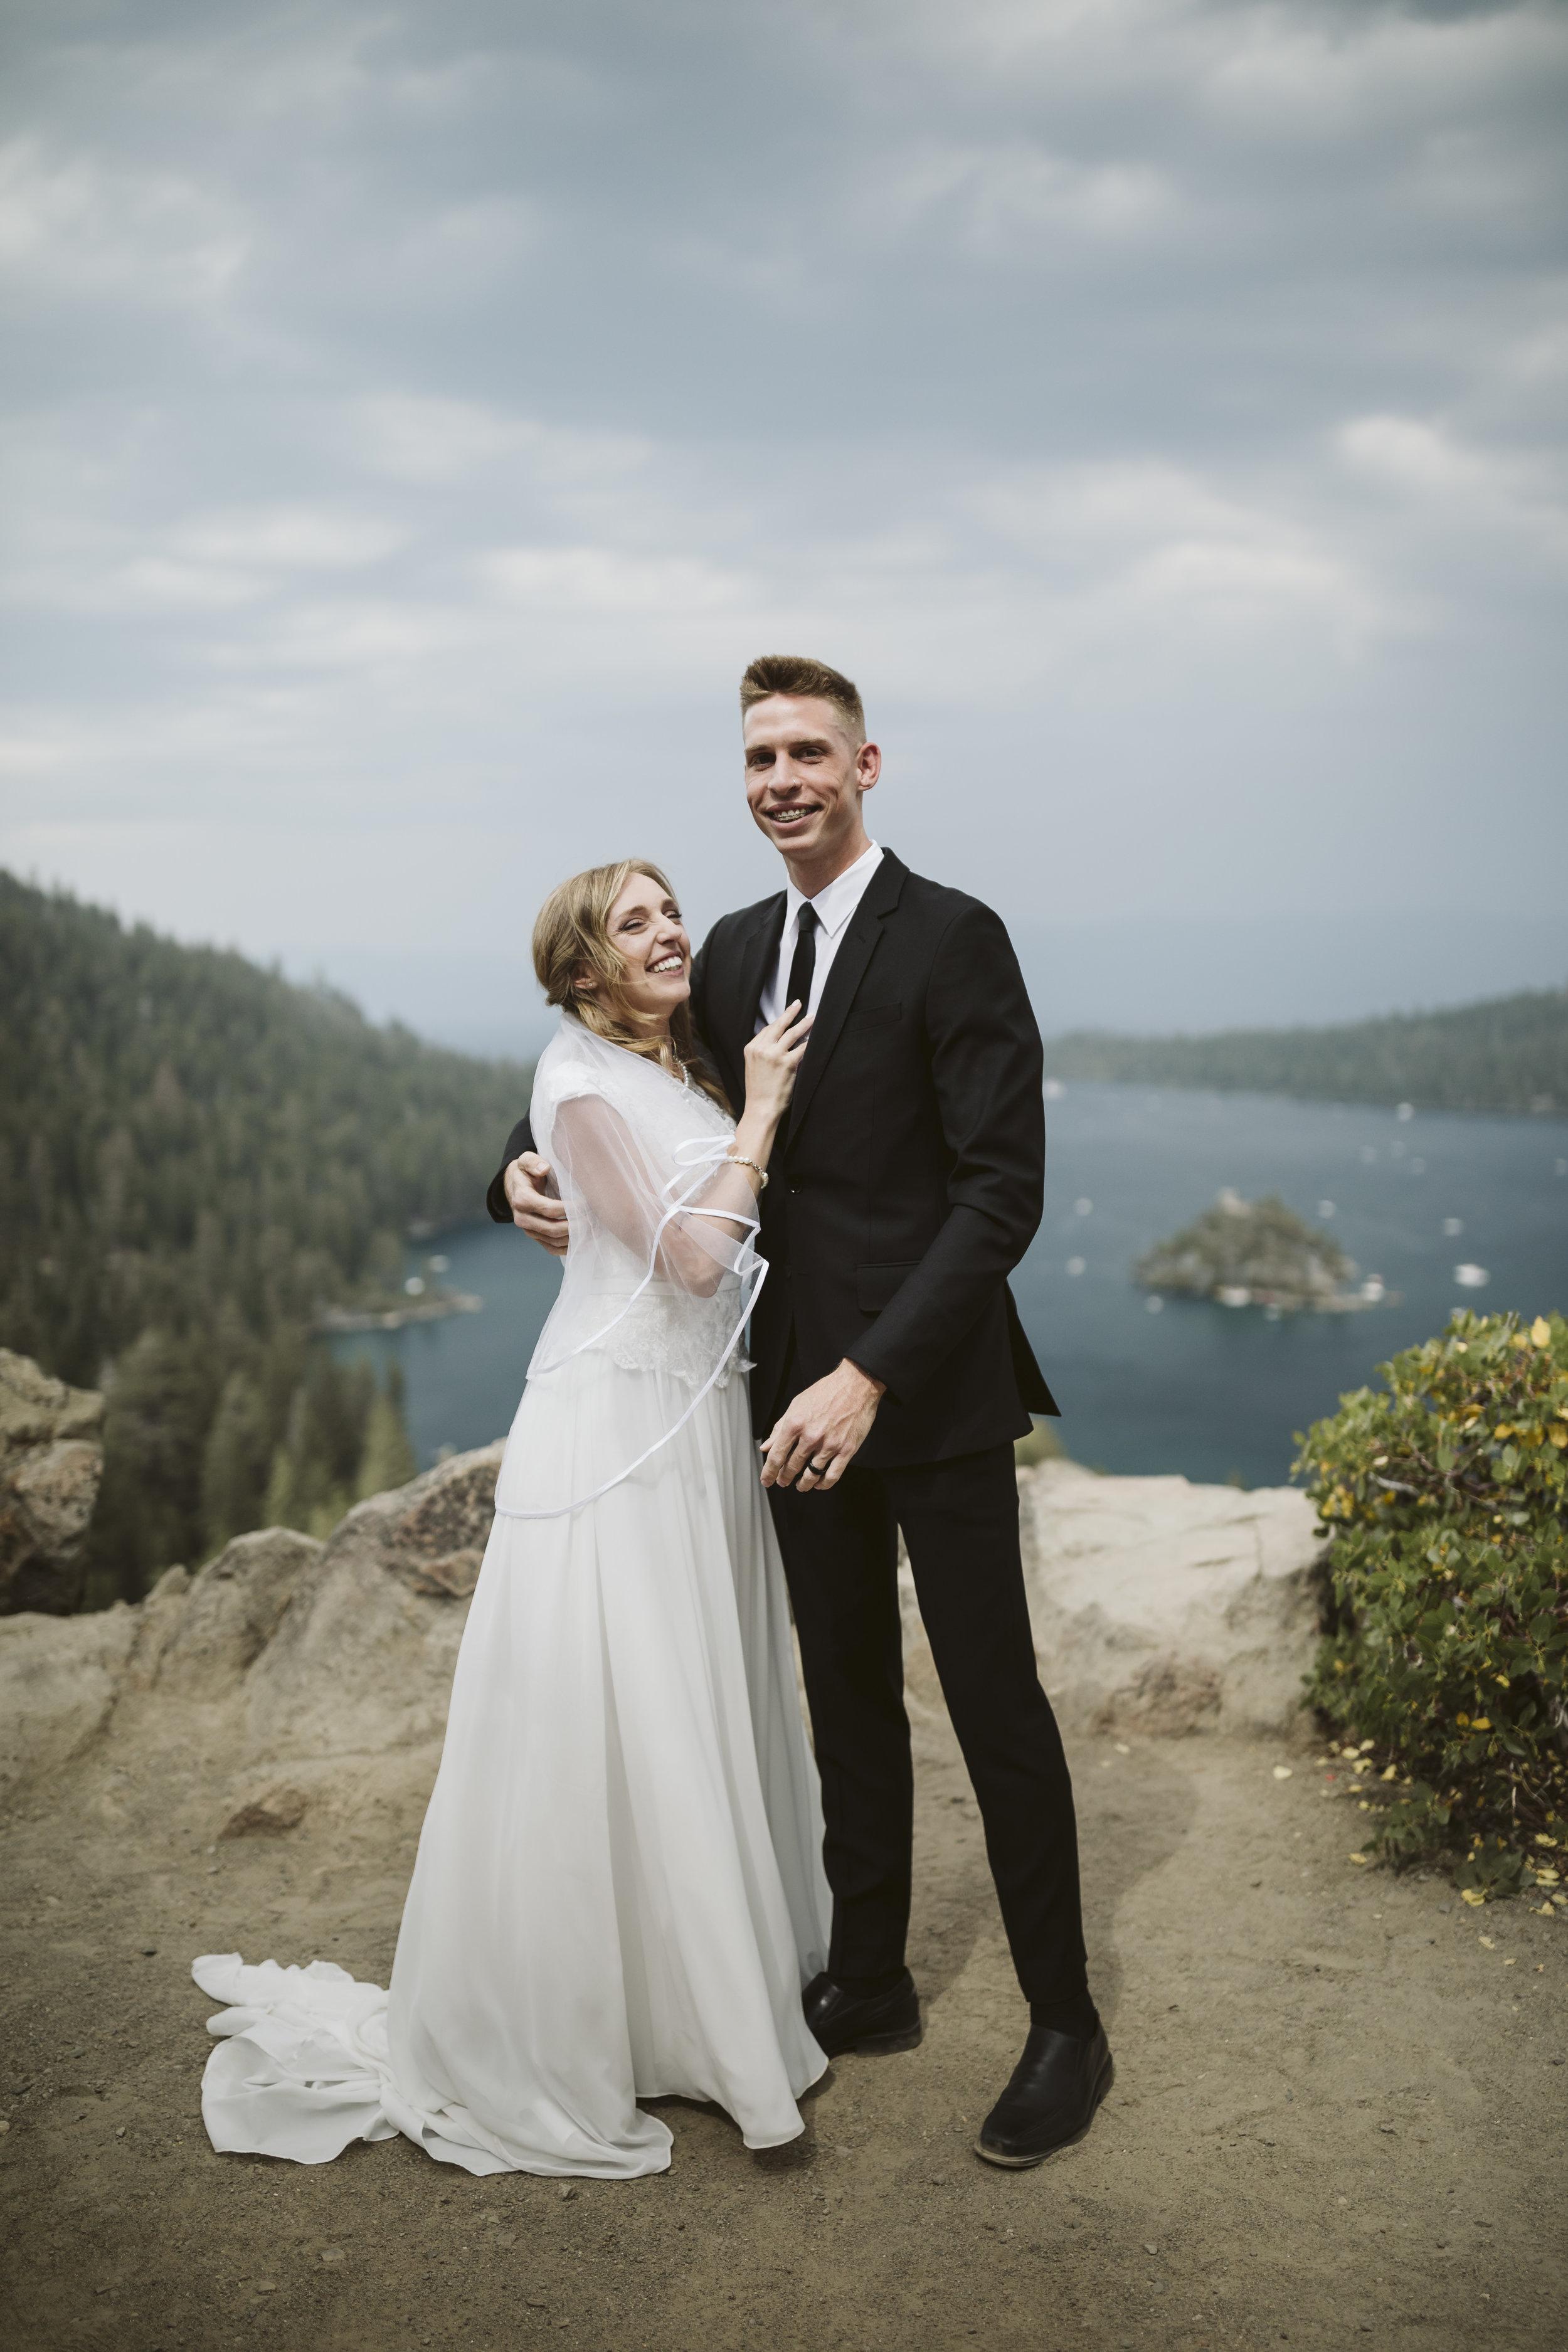 0M7A0773vildphotography-adventurewedding-adventurouswedding-tahoewedding-laketahoewedding-adventureelopement-laketahoeweddingphotographer-wedding-photographer-weddingphotographer-Chase-Sam.jpg